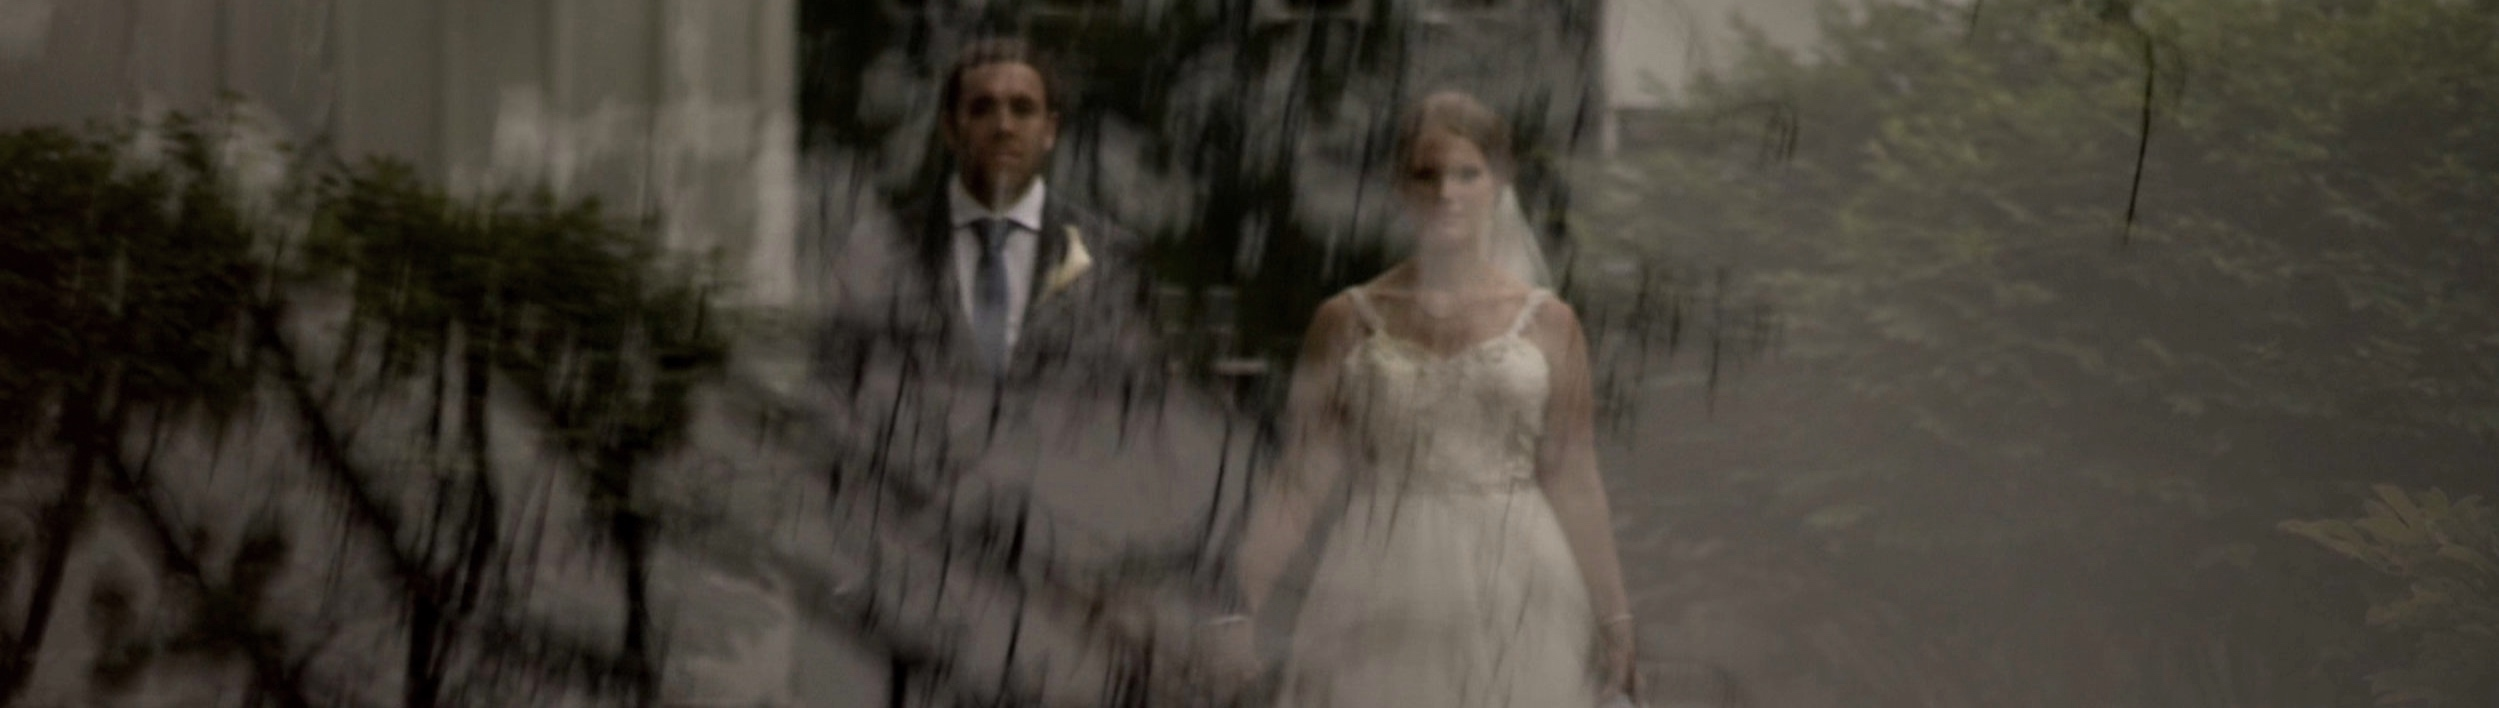 Destination wedding Videographer -